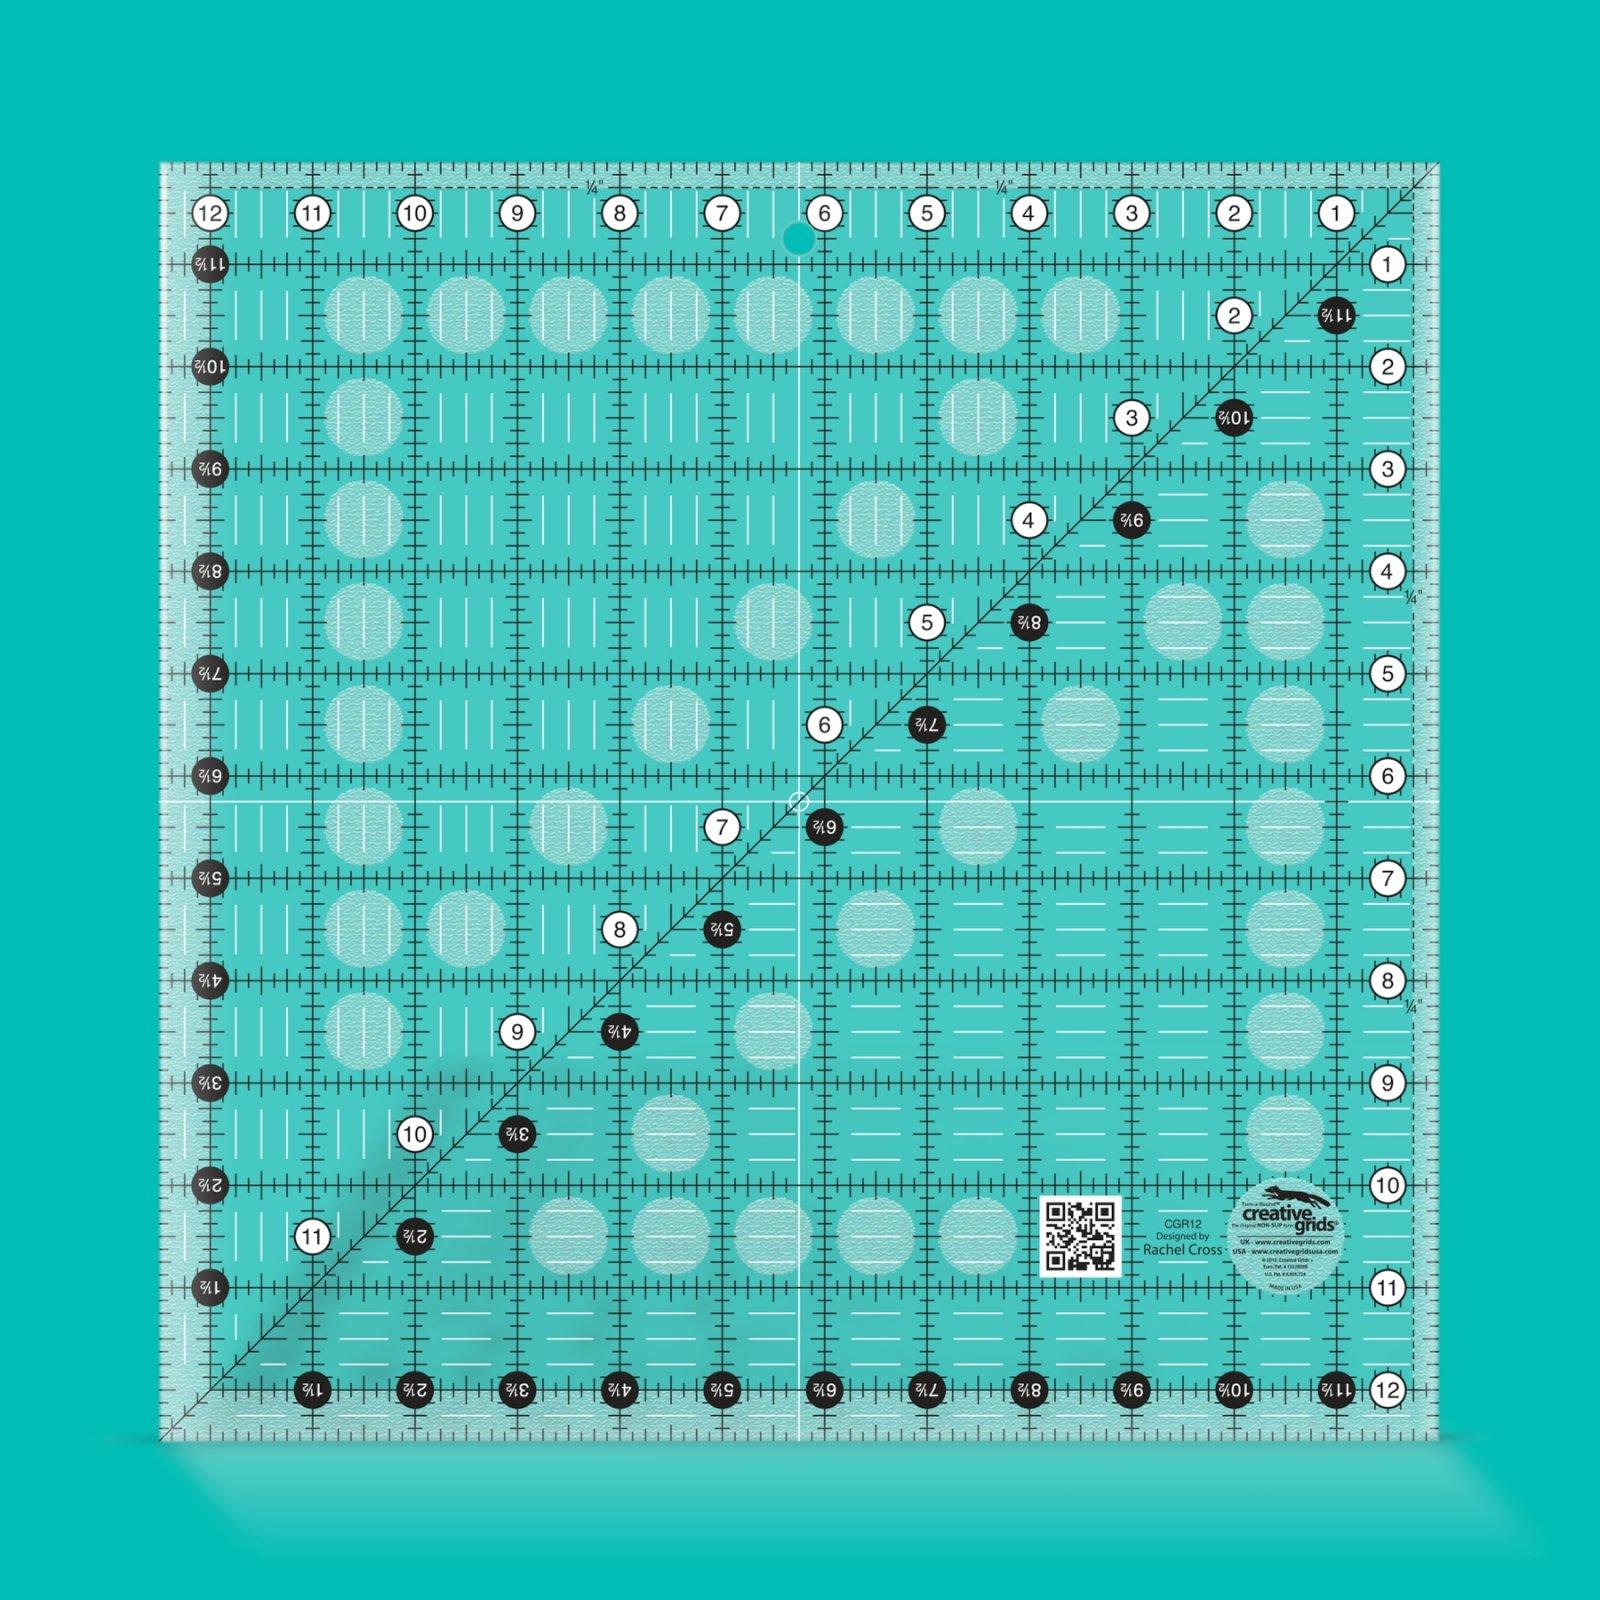 Ruler: 12 1/2 Square